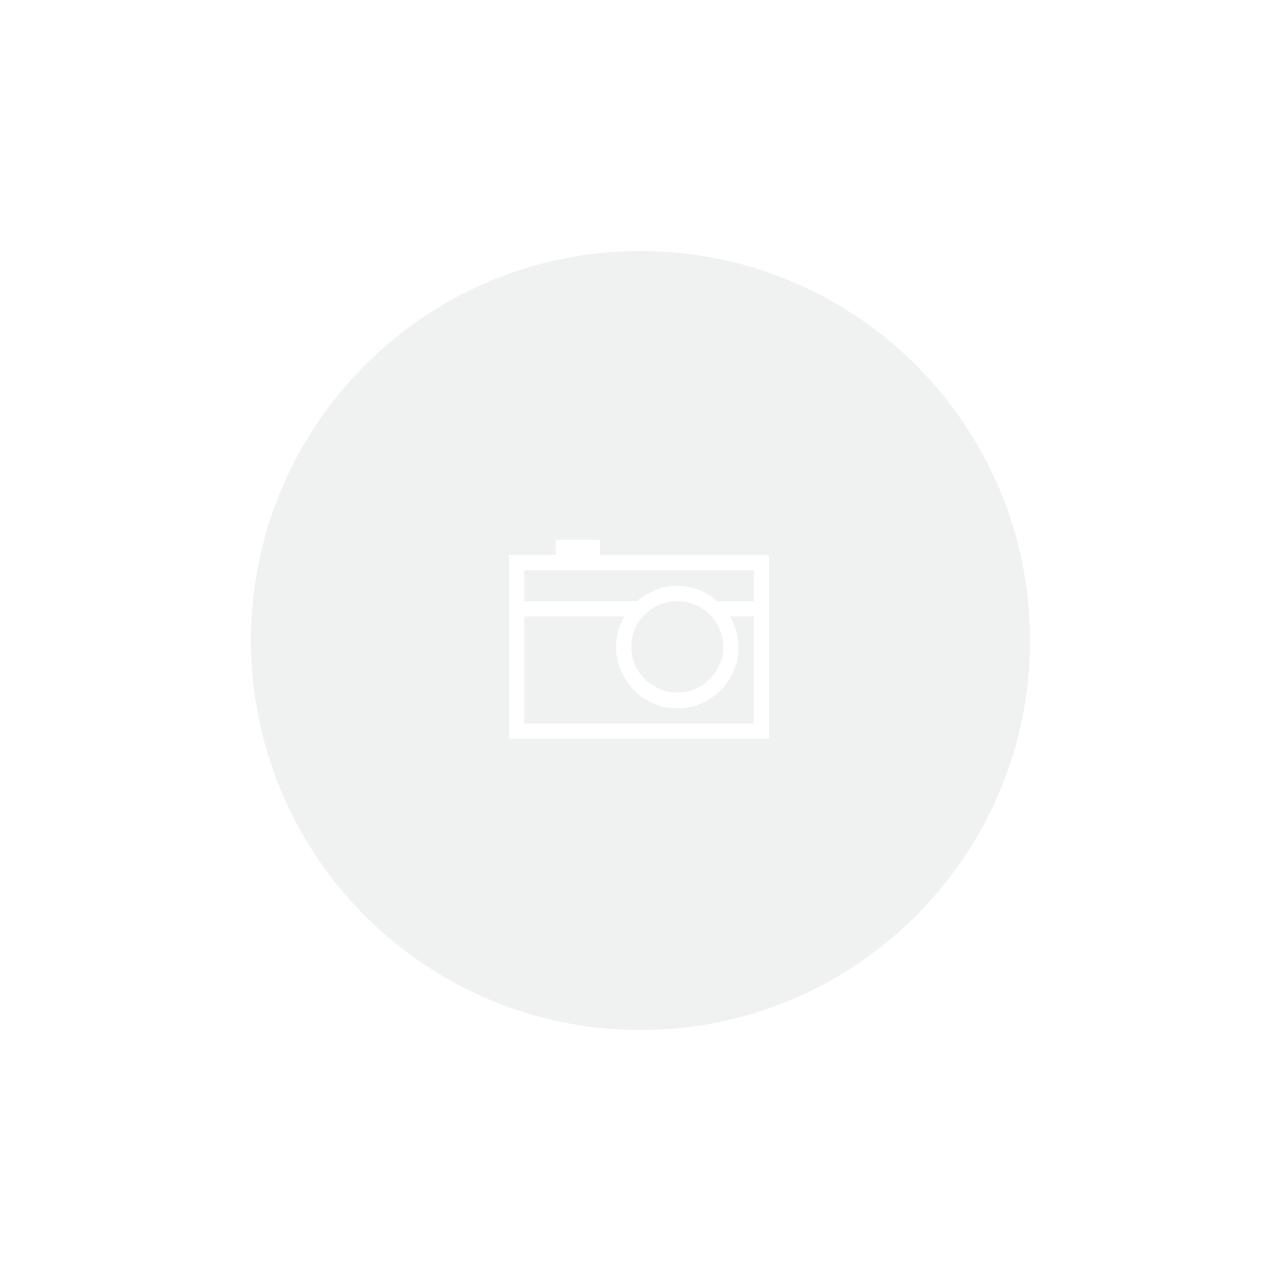 ALAVANCA STI 22V SHIMANO R7000 105 (ISTR7000DPAL)